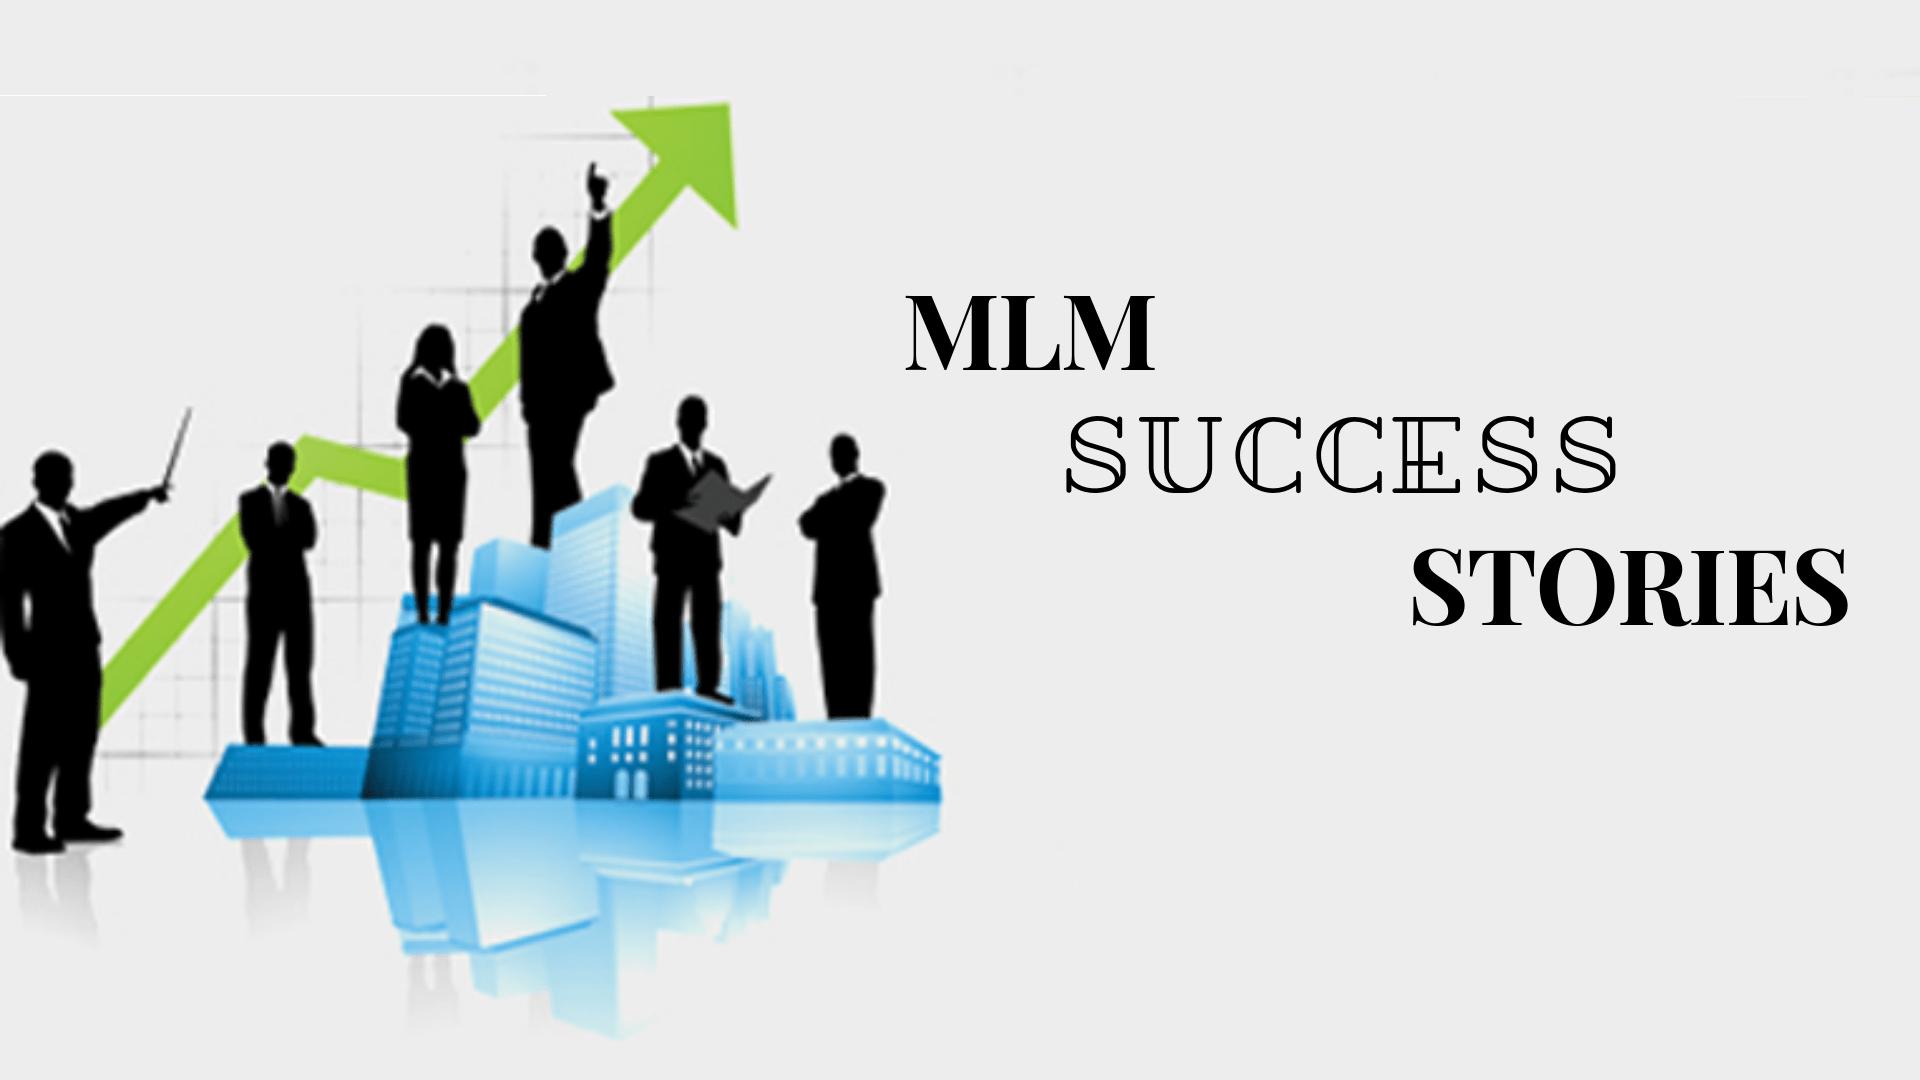 MLM success stories